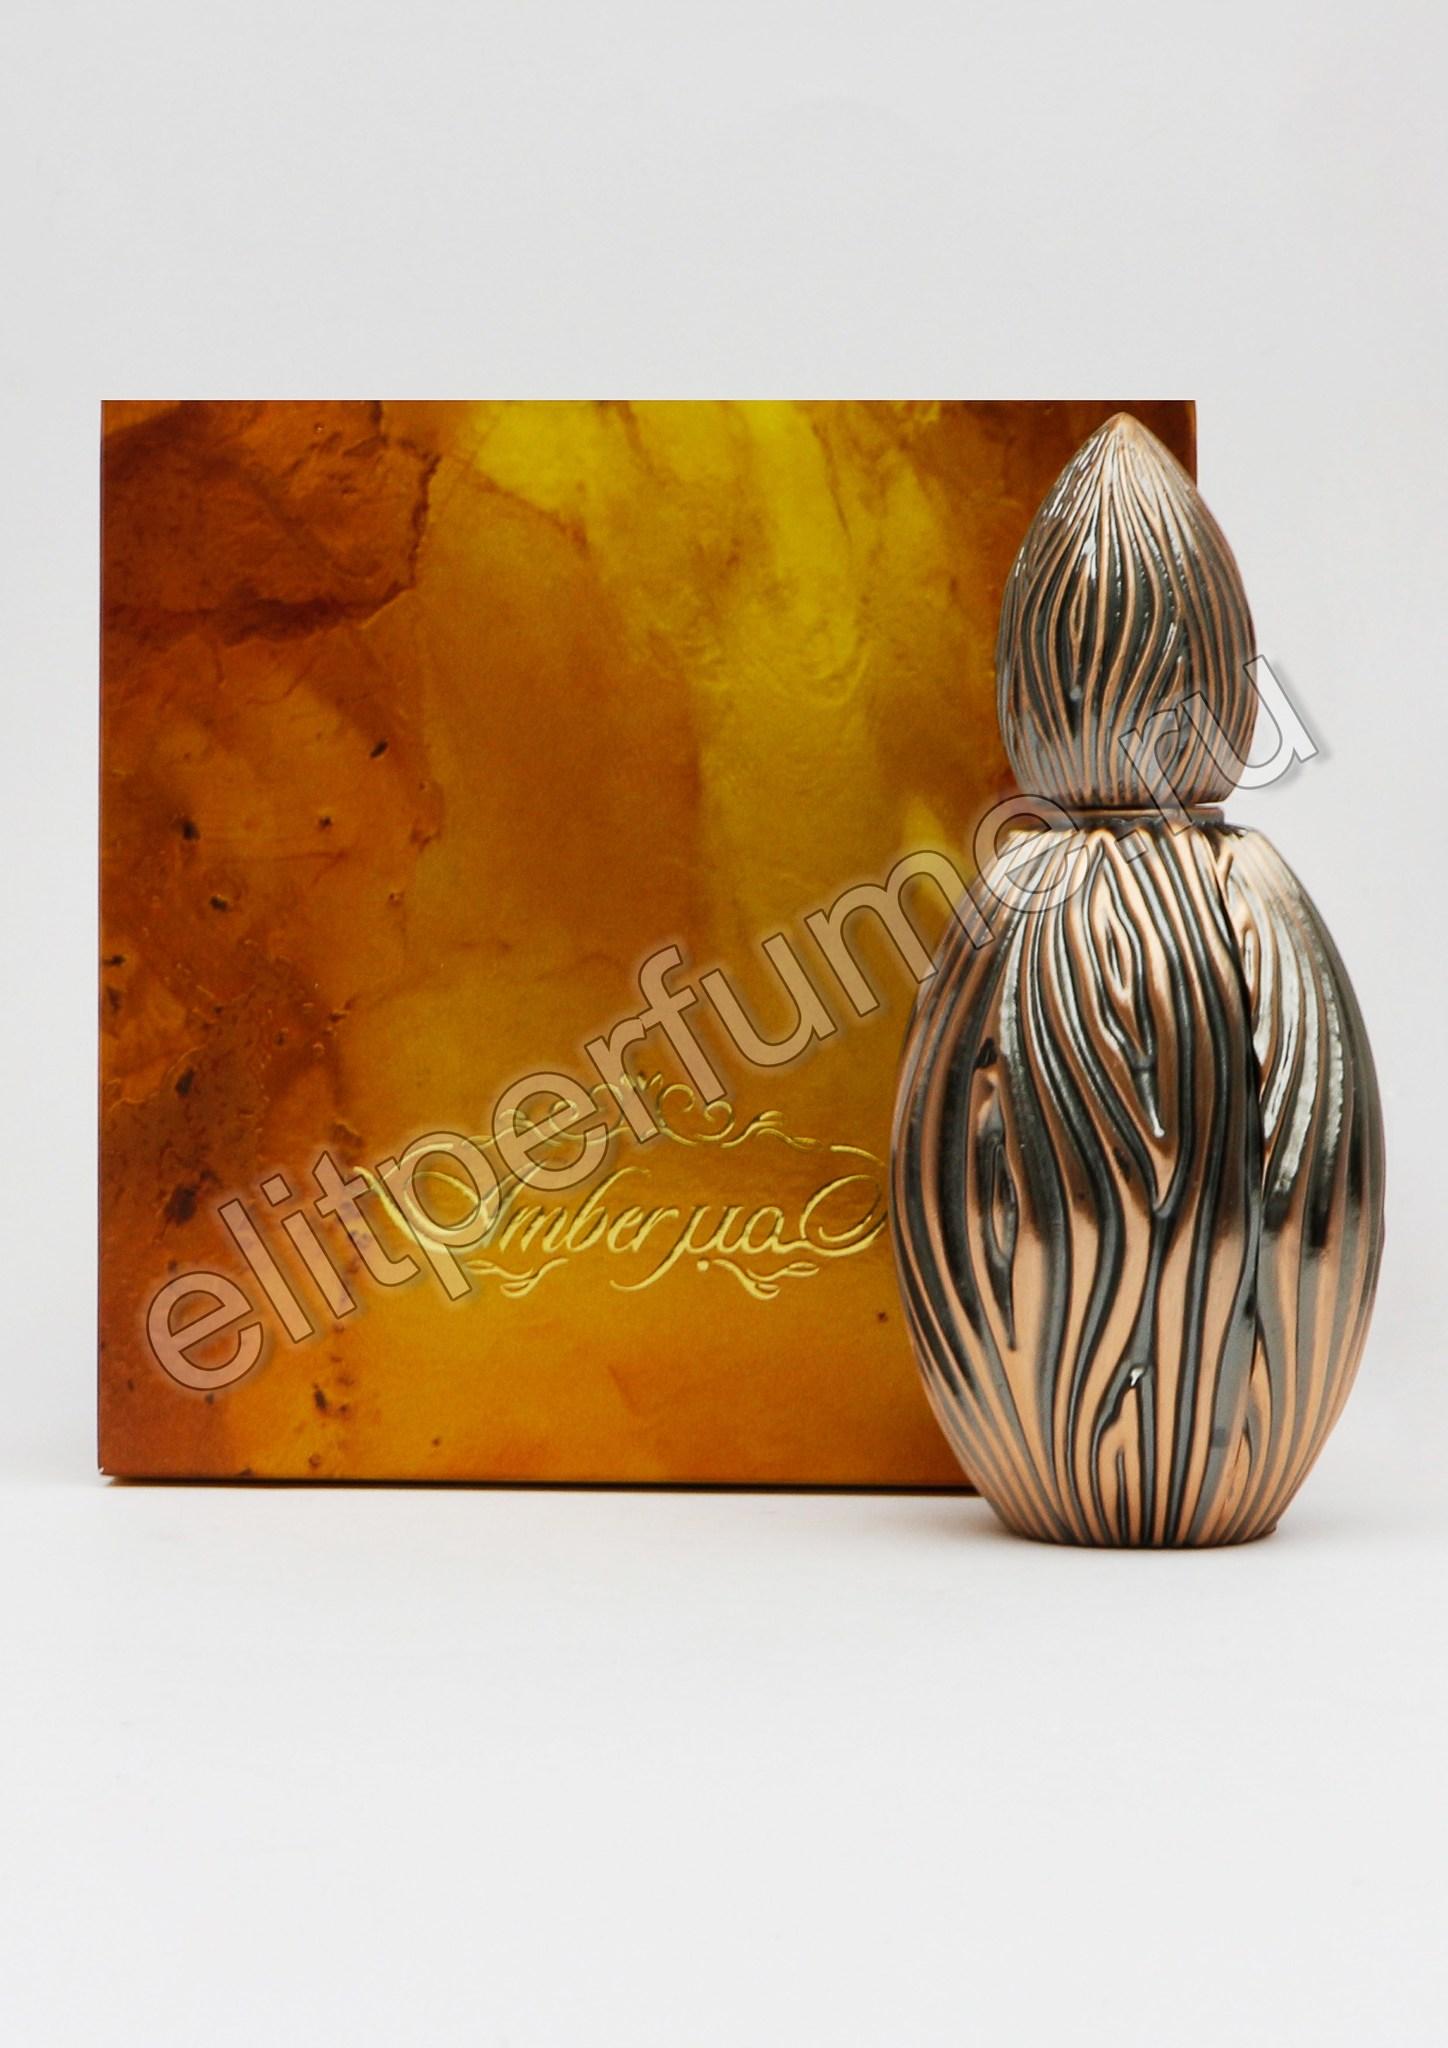 Amber  Янтарный 24 мл арабские масляные духи от Саид Джунаид Алам Syed Junaid Alam